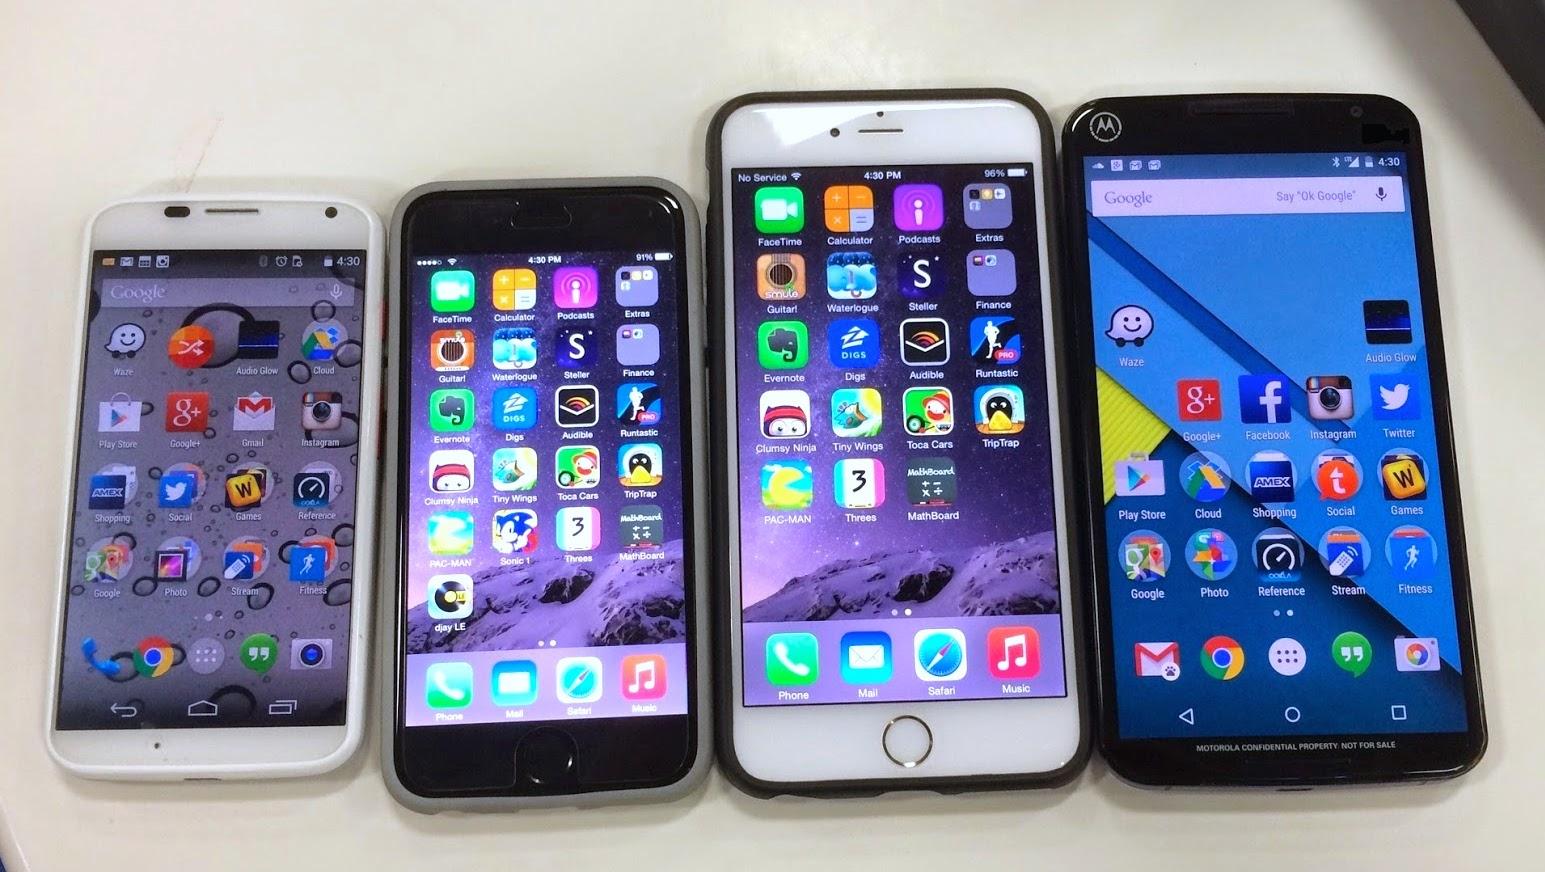 Nexus 6 camera samples and size comparison